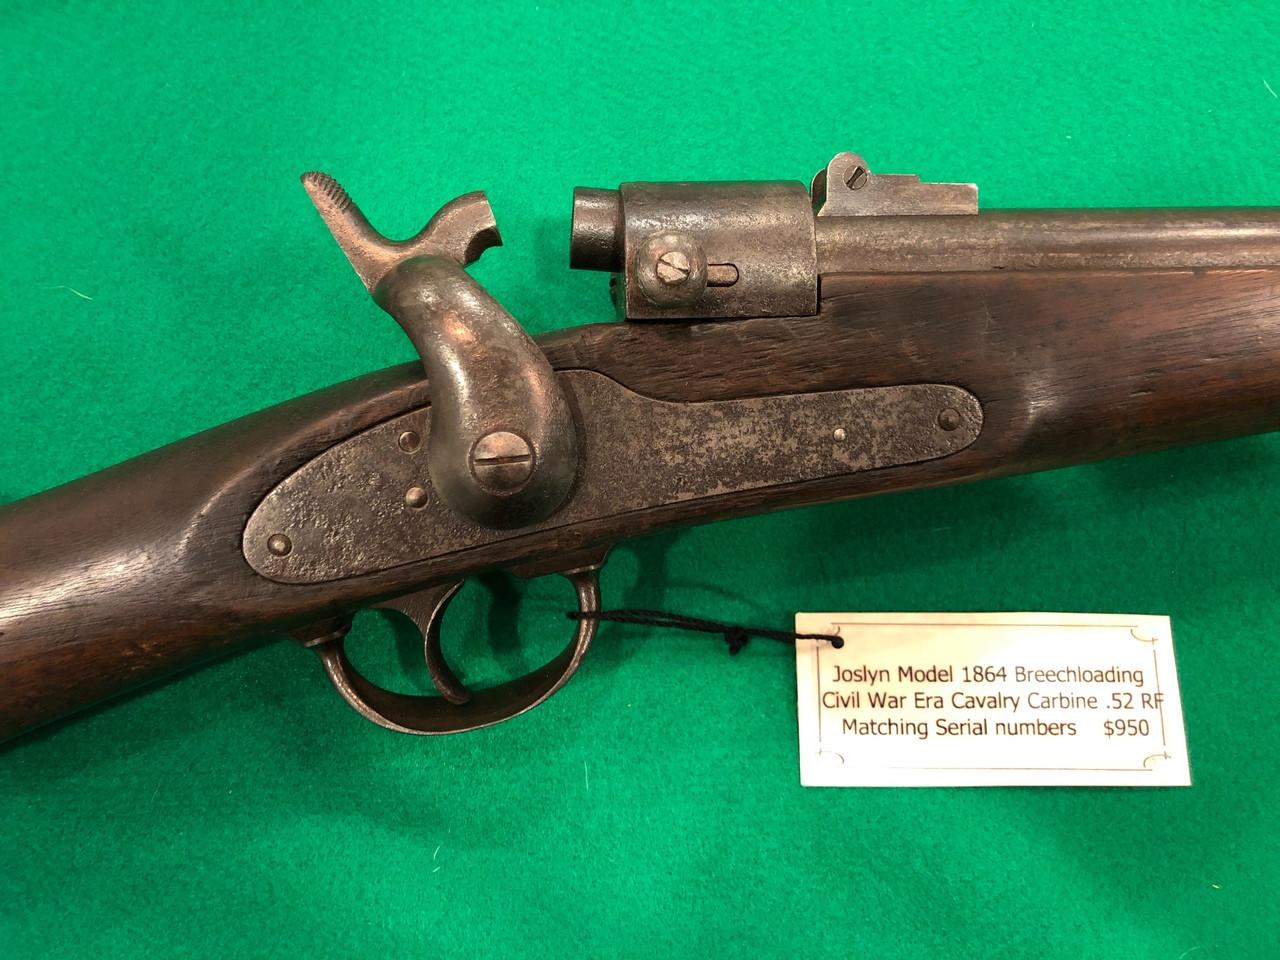 SOLD- Jocelyn model 1864 breech-loading Civil War era Calvary carbine